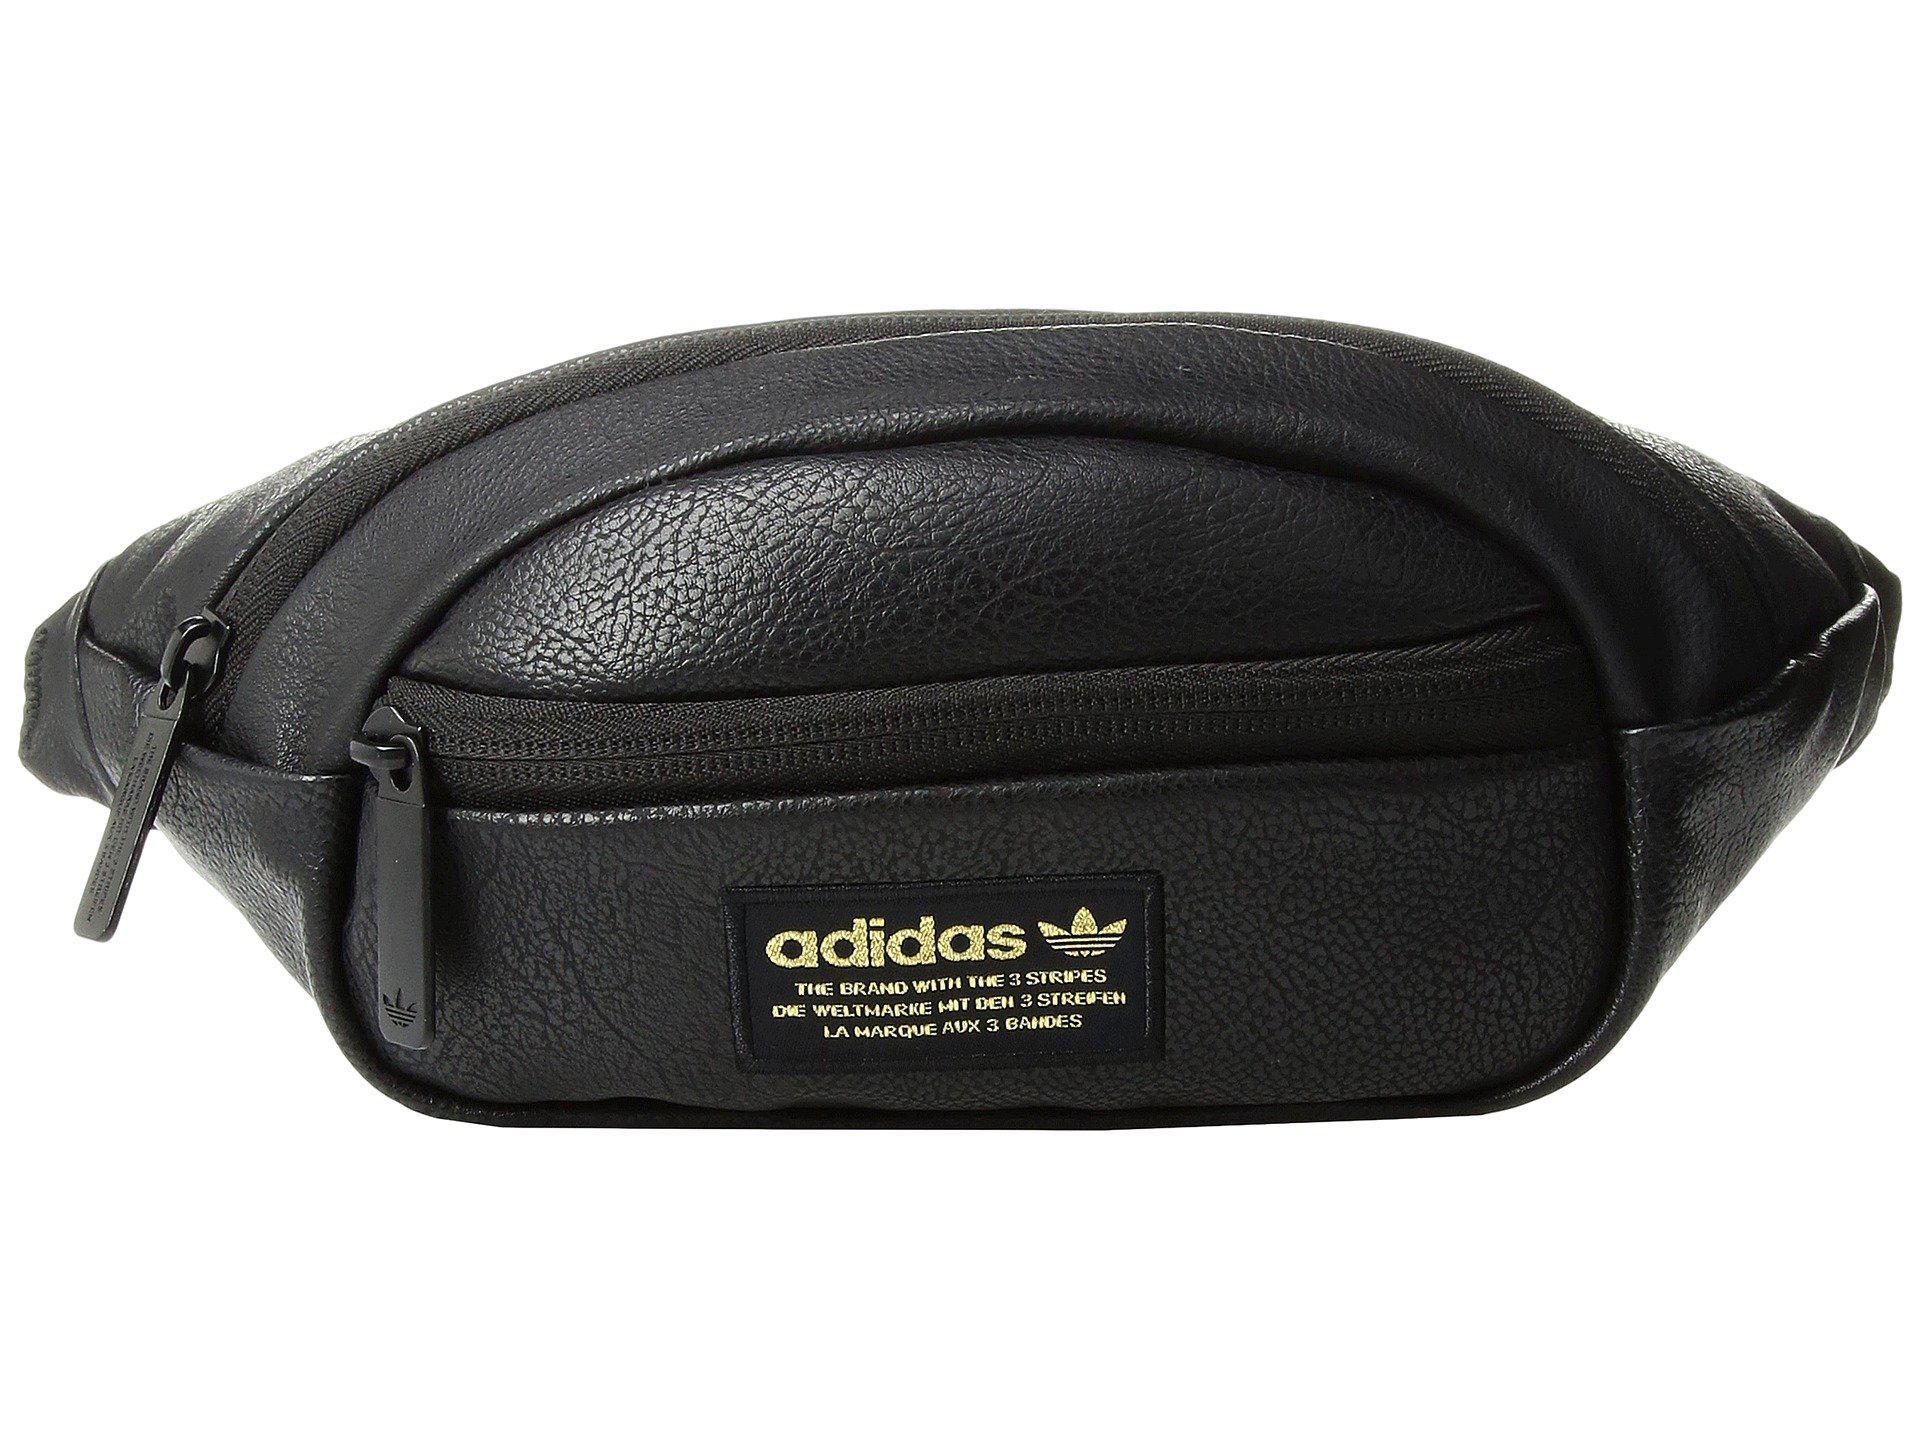 92e065fe4c Lyst - adidas Originals Originals National Waist Pack in Black